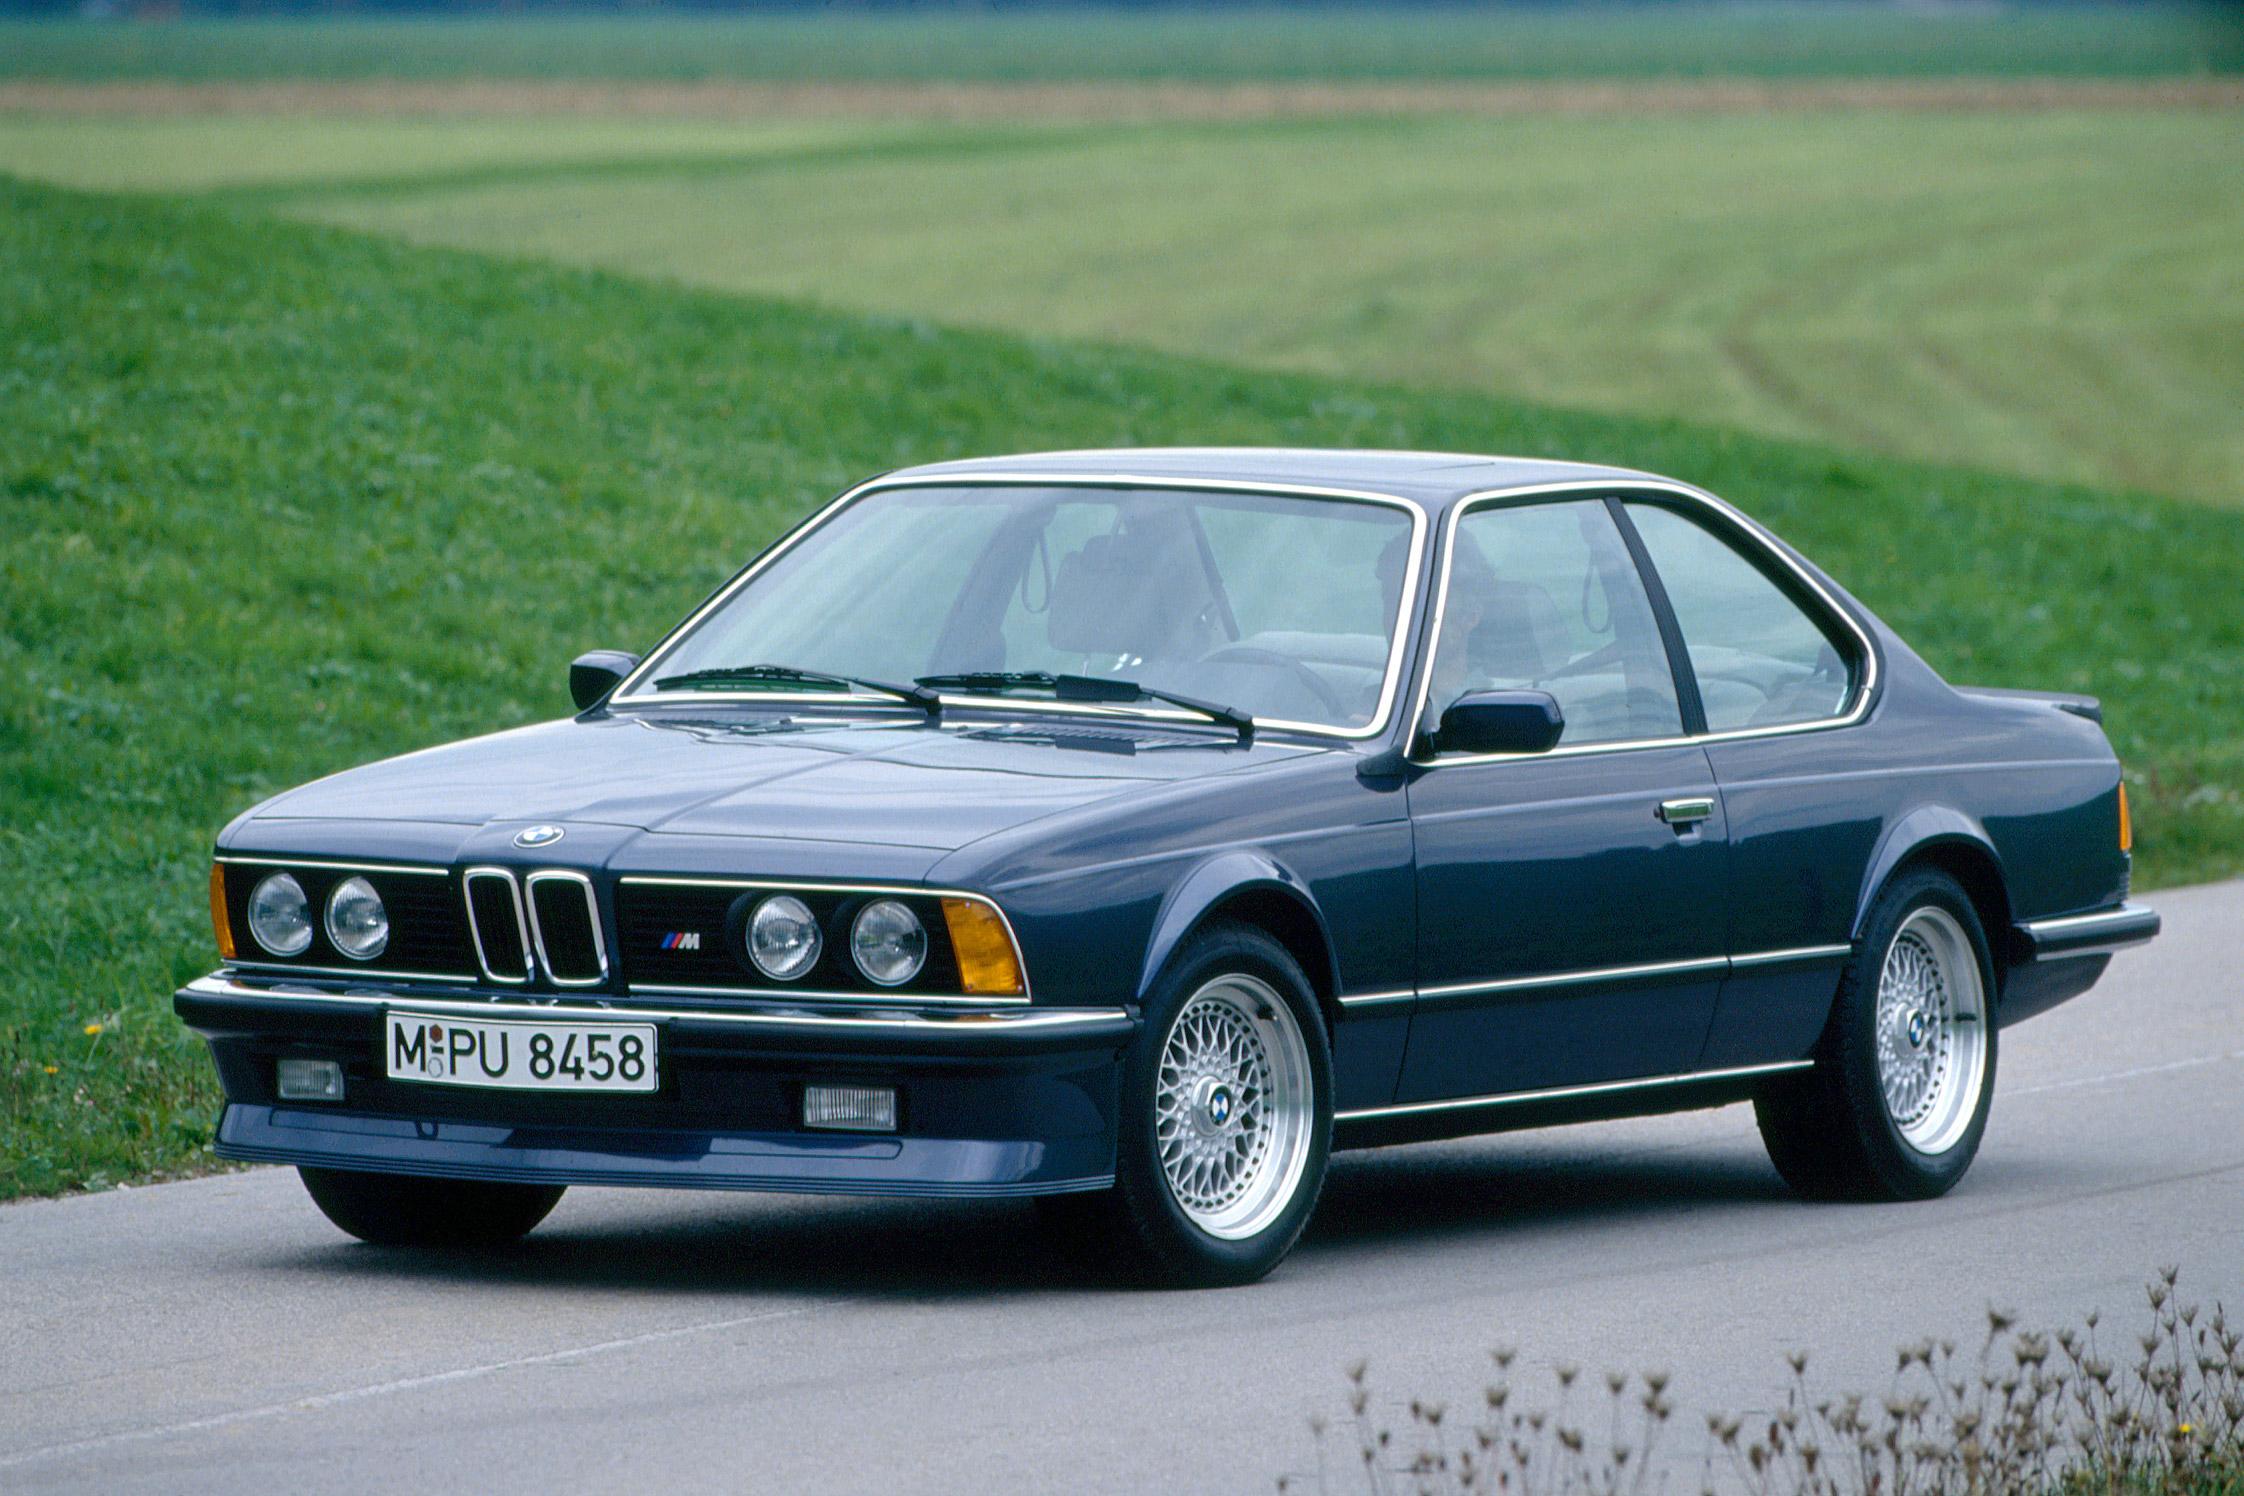 BMW M635CSi - BMW Motorsport fête ses 40 ans - diaporama ...